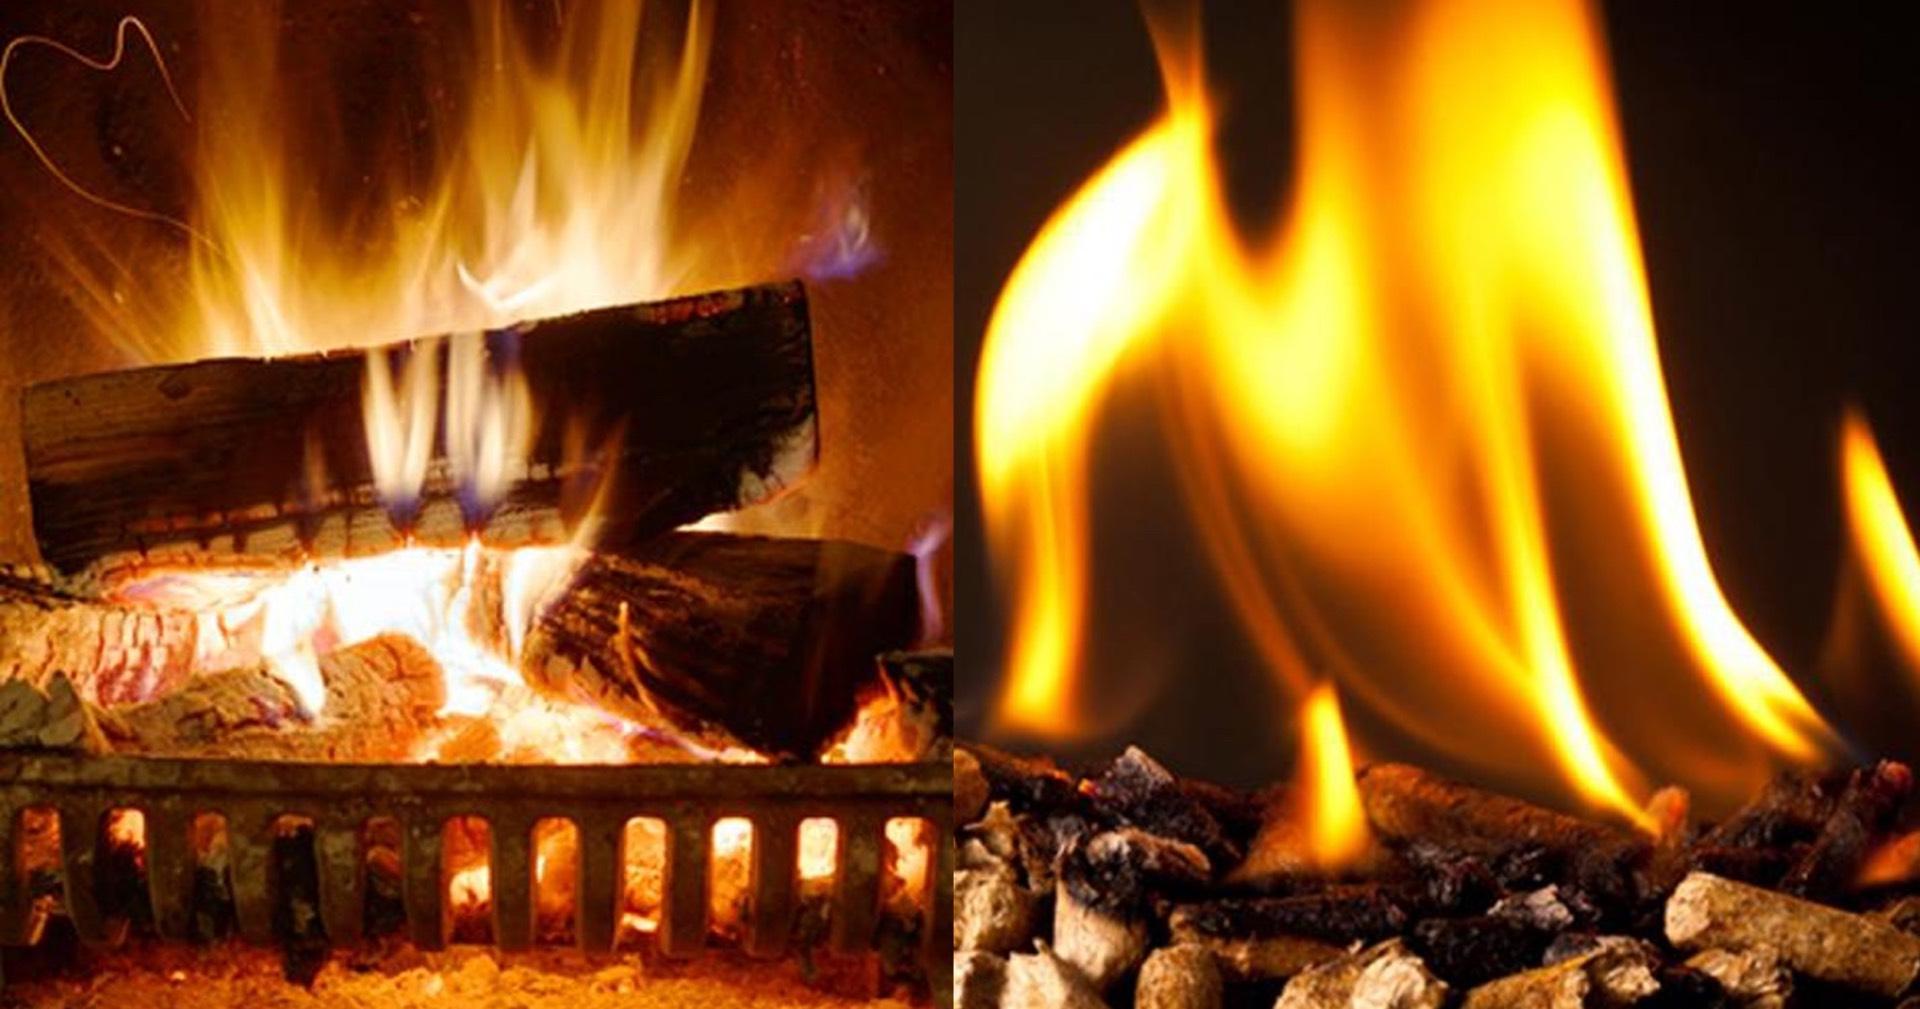 Stufa A Legna Stile Inglese caminetti e stufe bologna, barbecue bologna, stufe a legna e